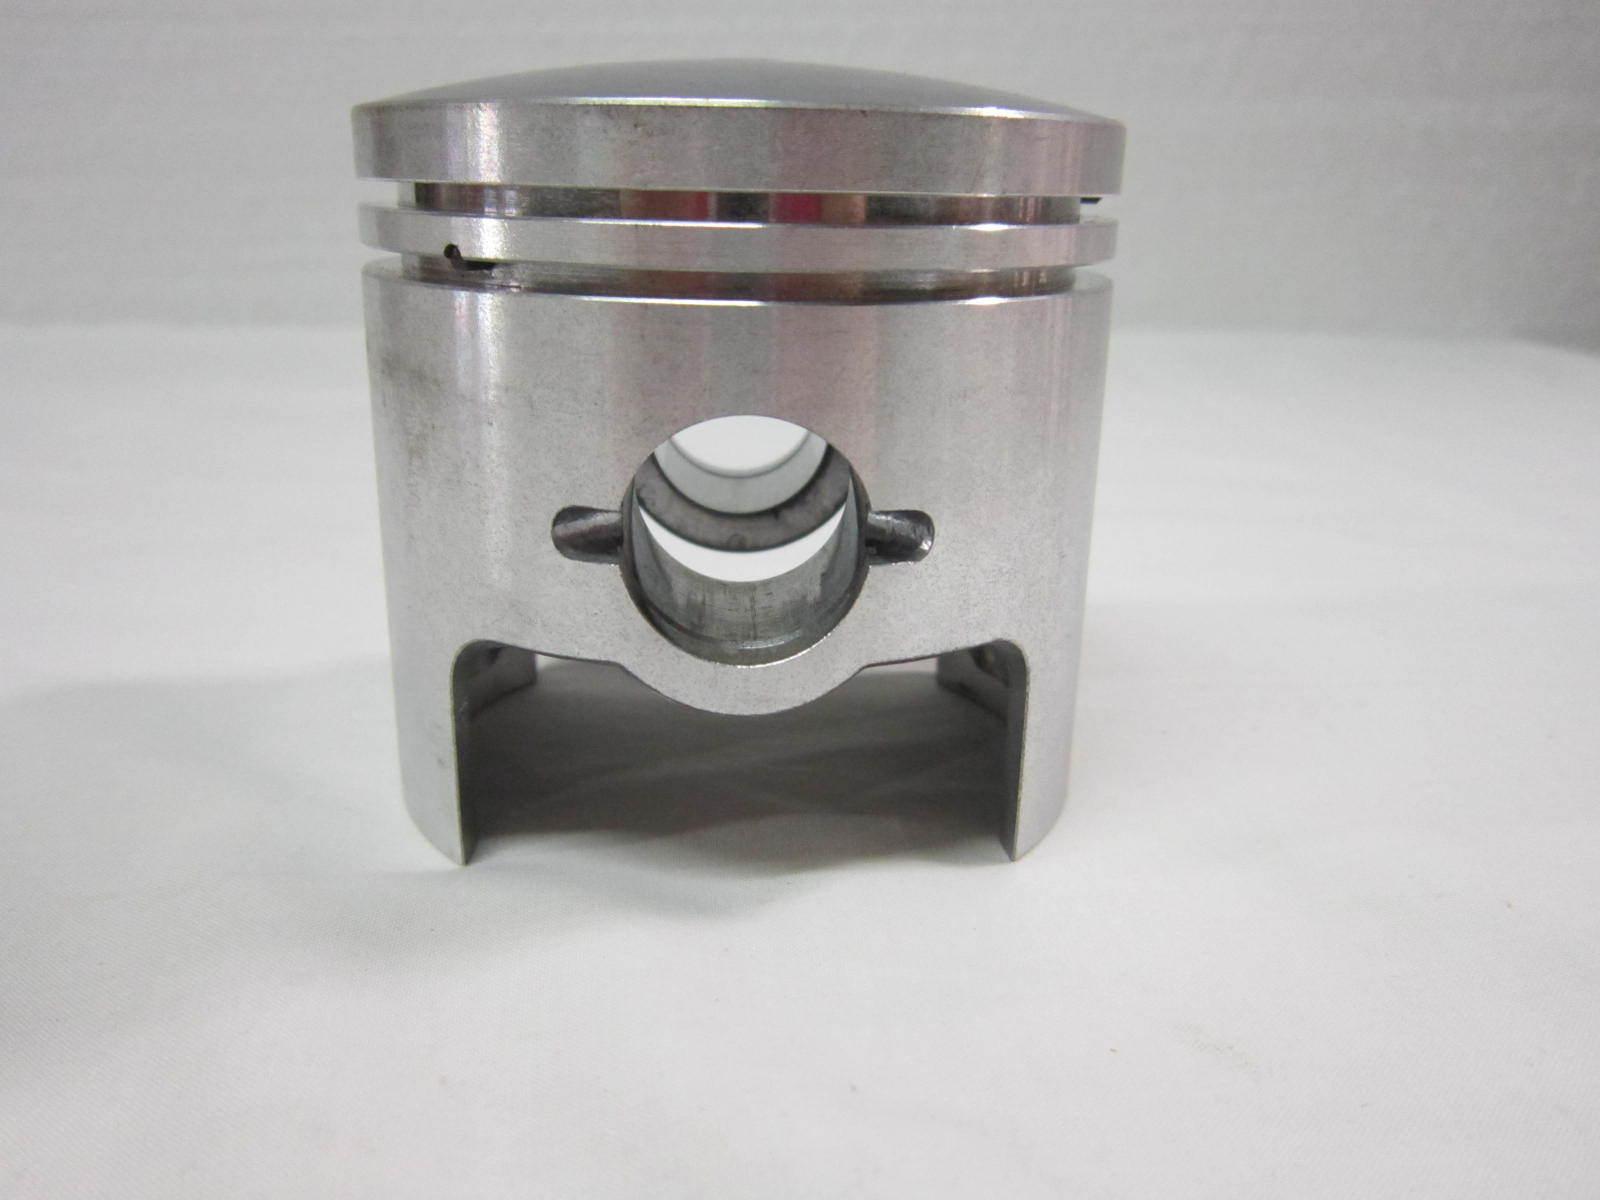 Zenoah engine 72mm piston factory original Fits 242 & 484 cc engines